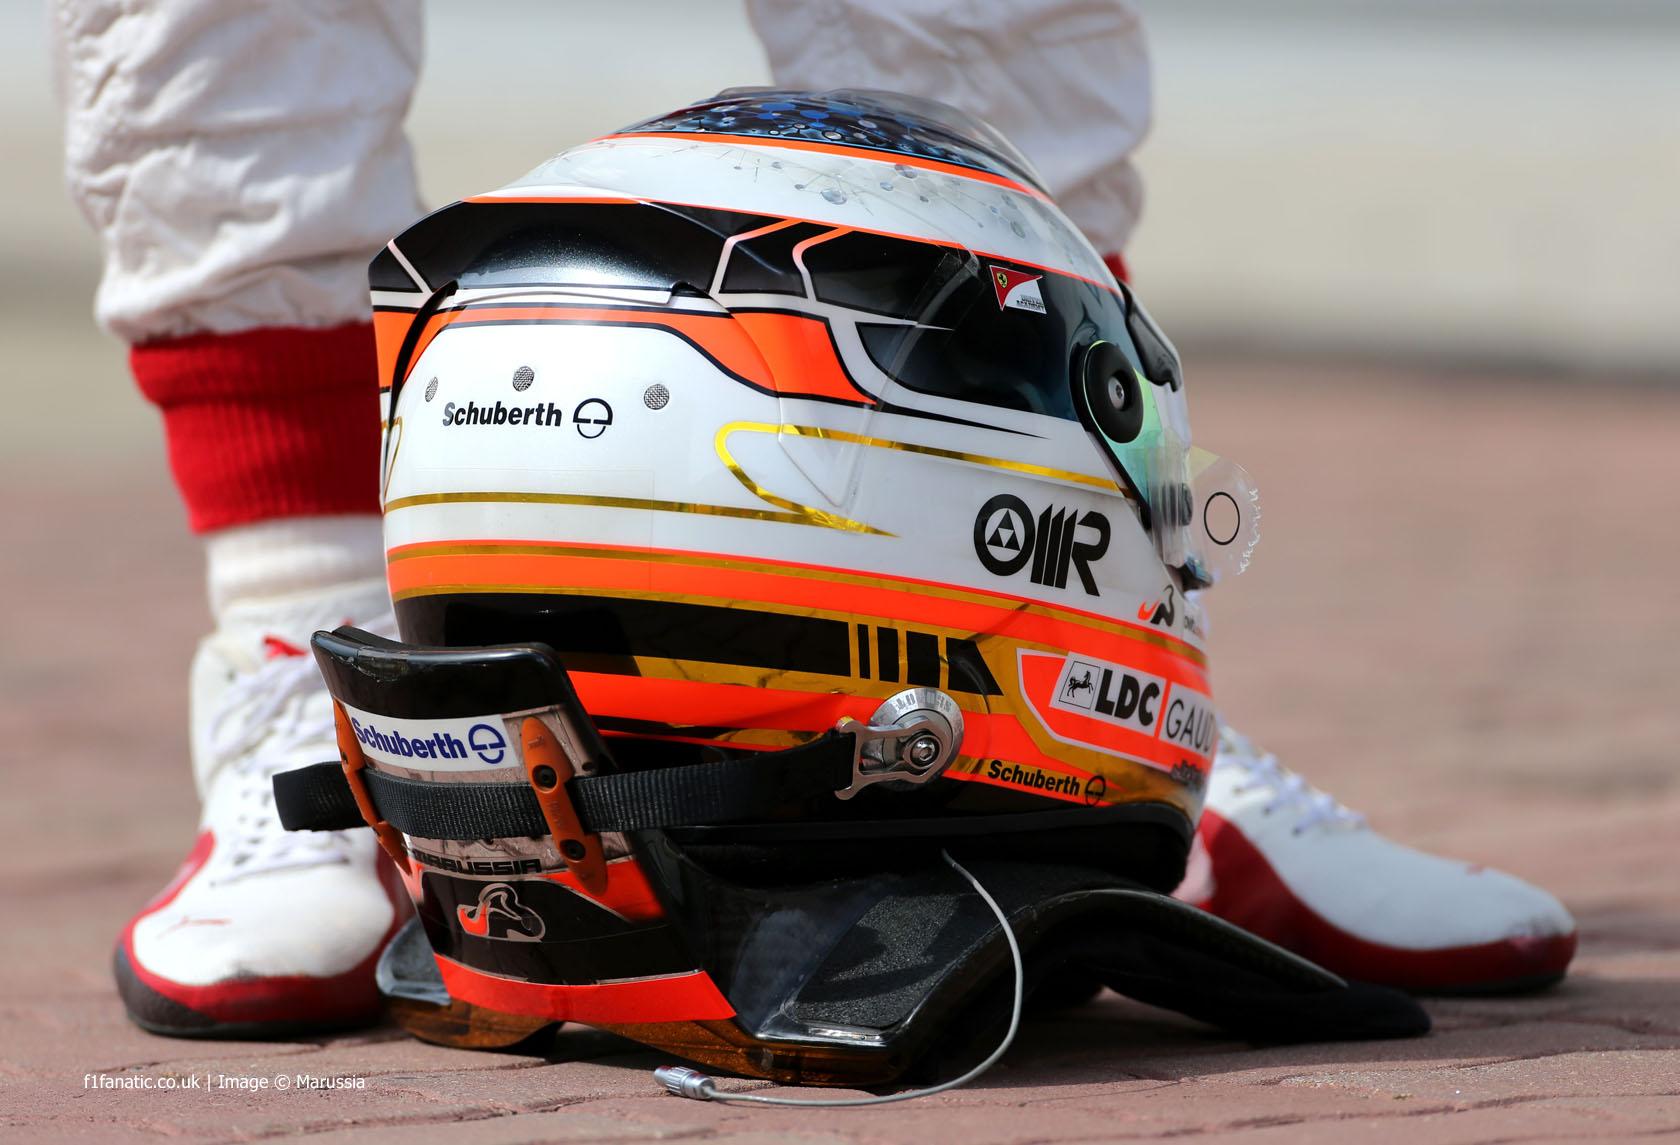 Jules Bianchi, Marussia, 2014